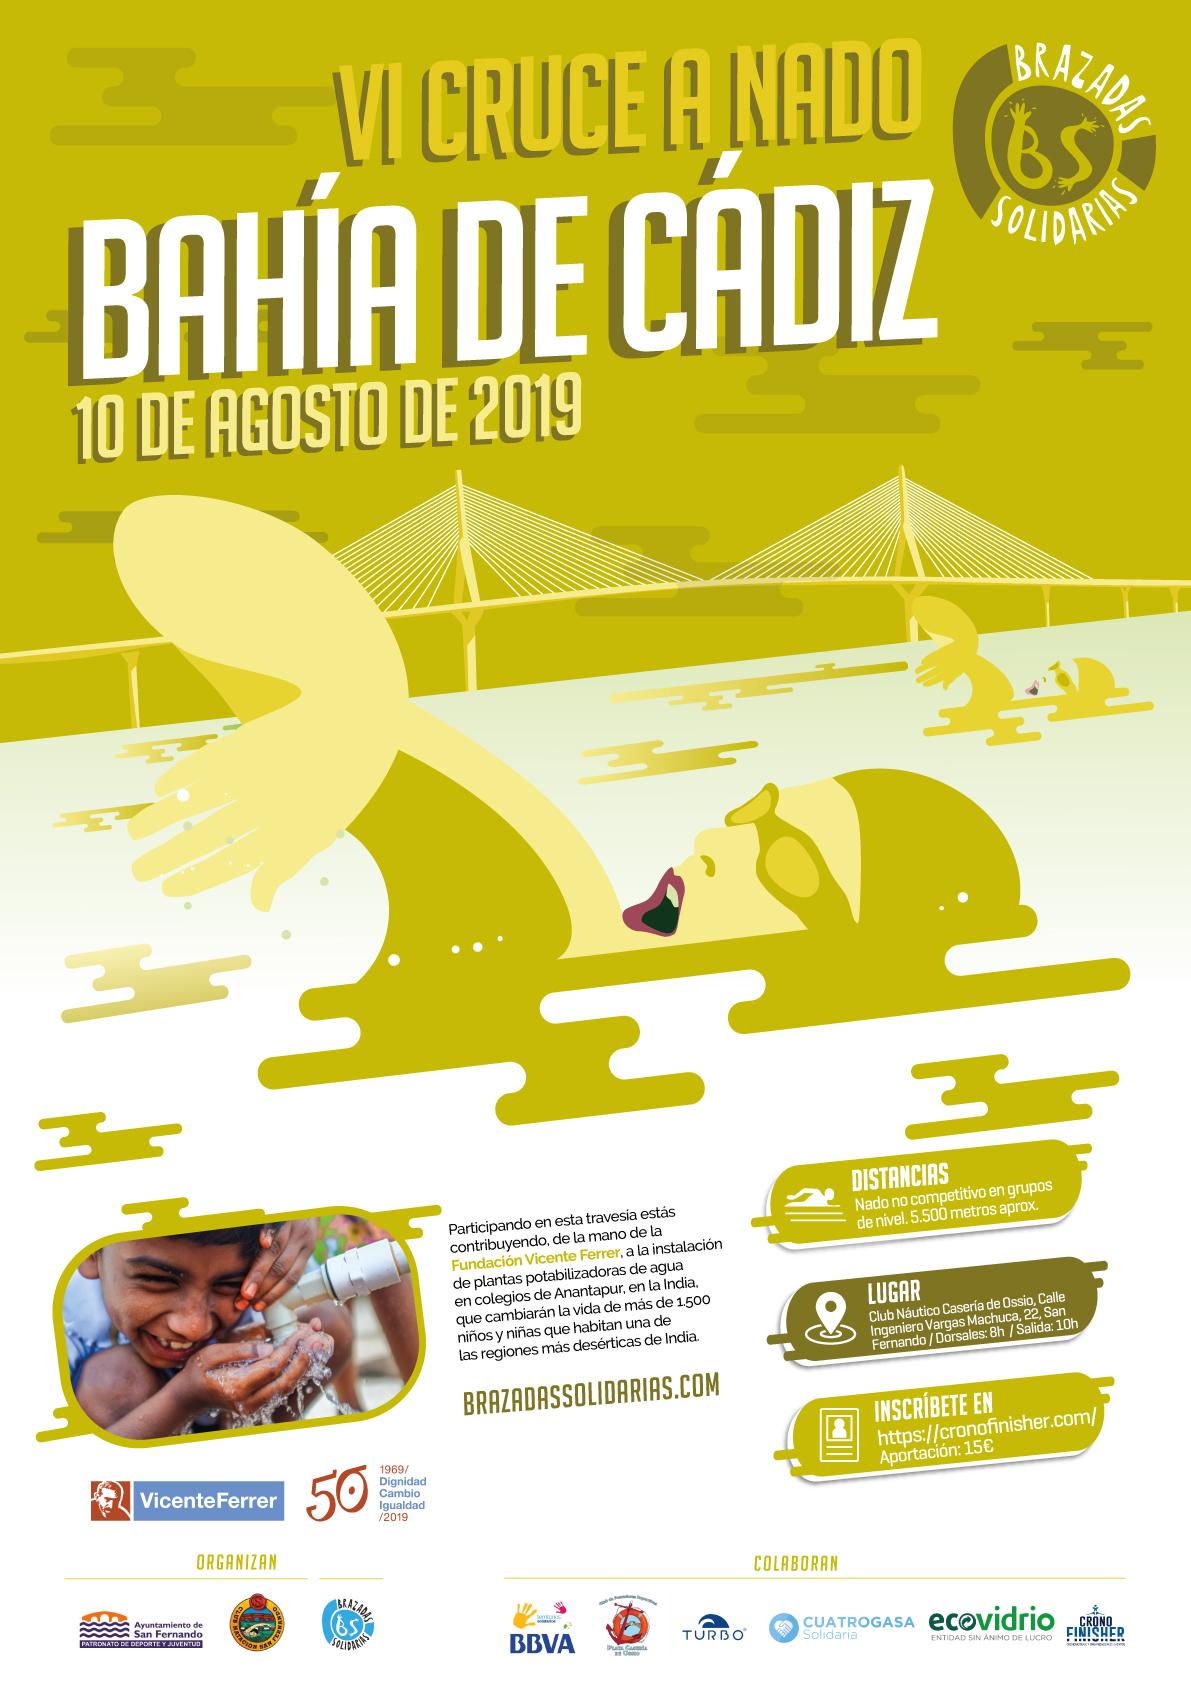 VI Cruce a nado de la Bahía de Cádiz